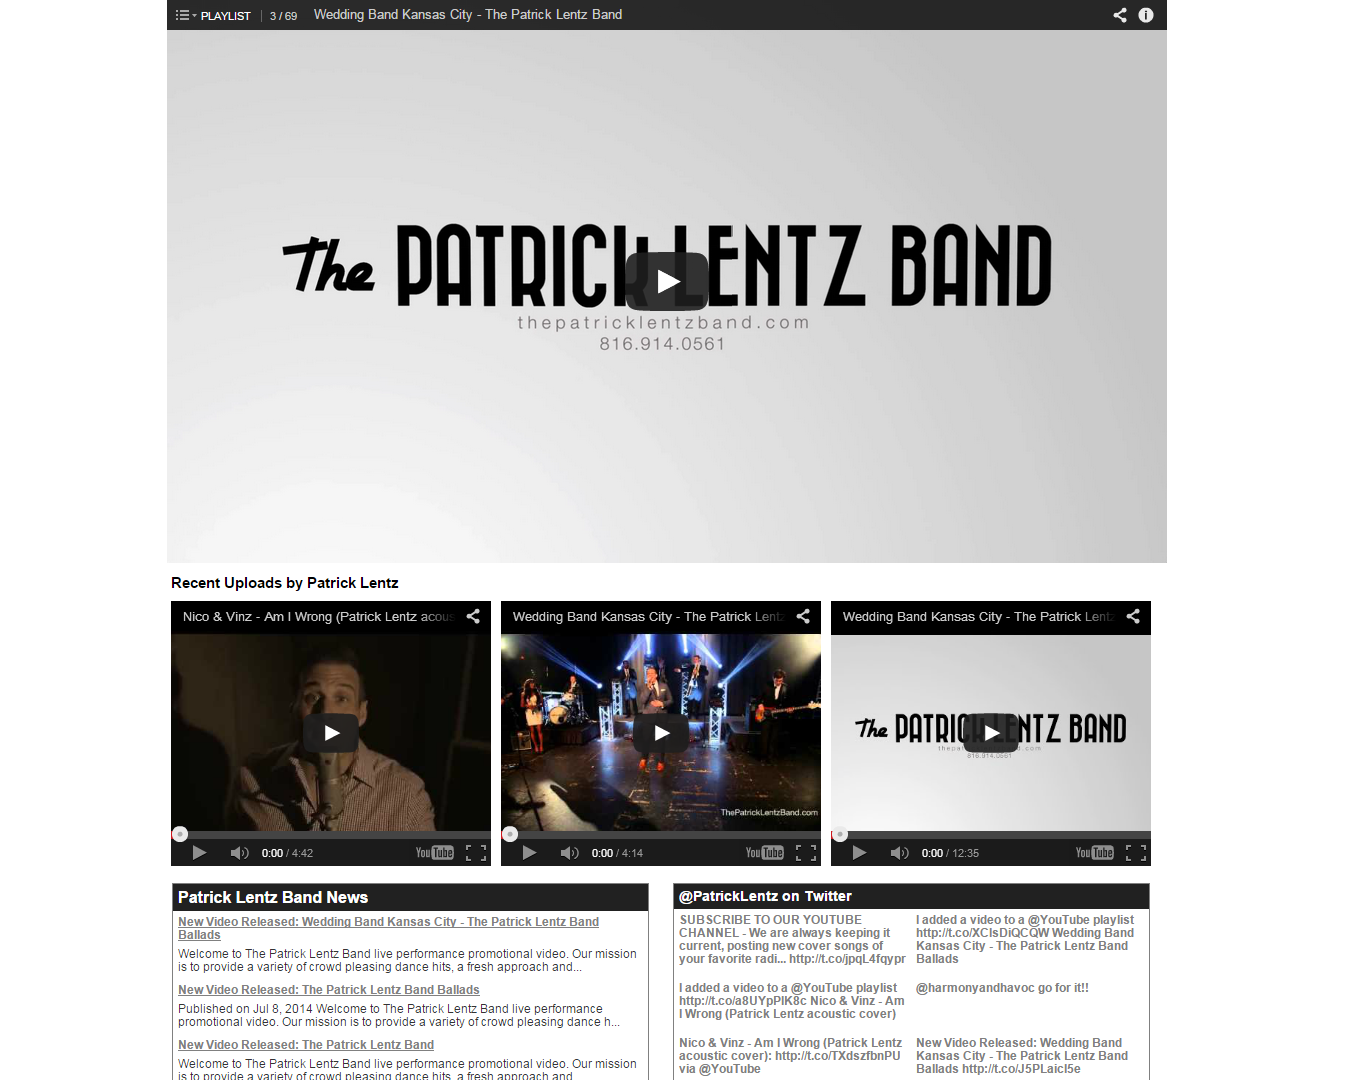 The Patrick Lentz Band